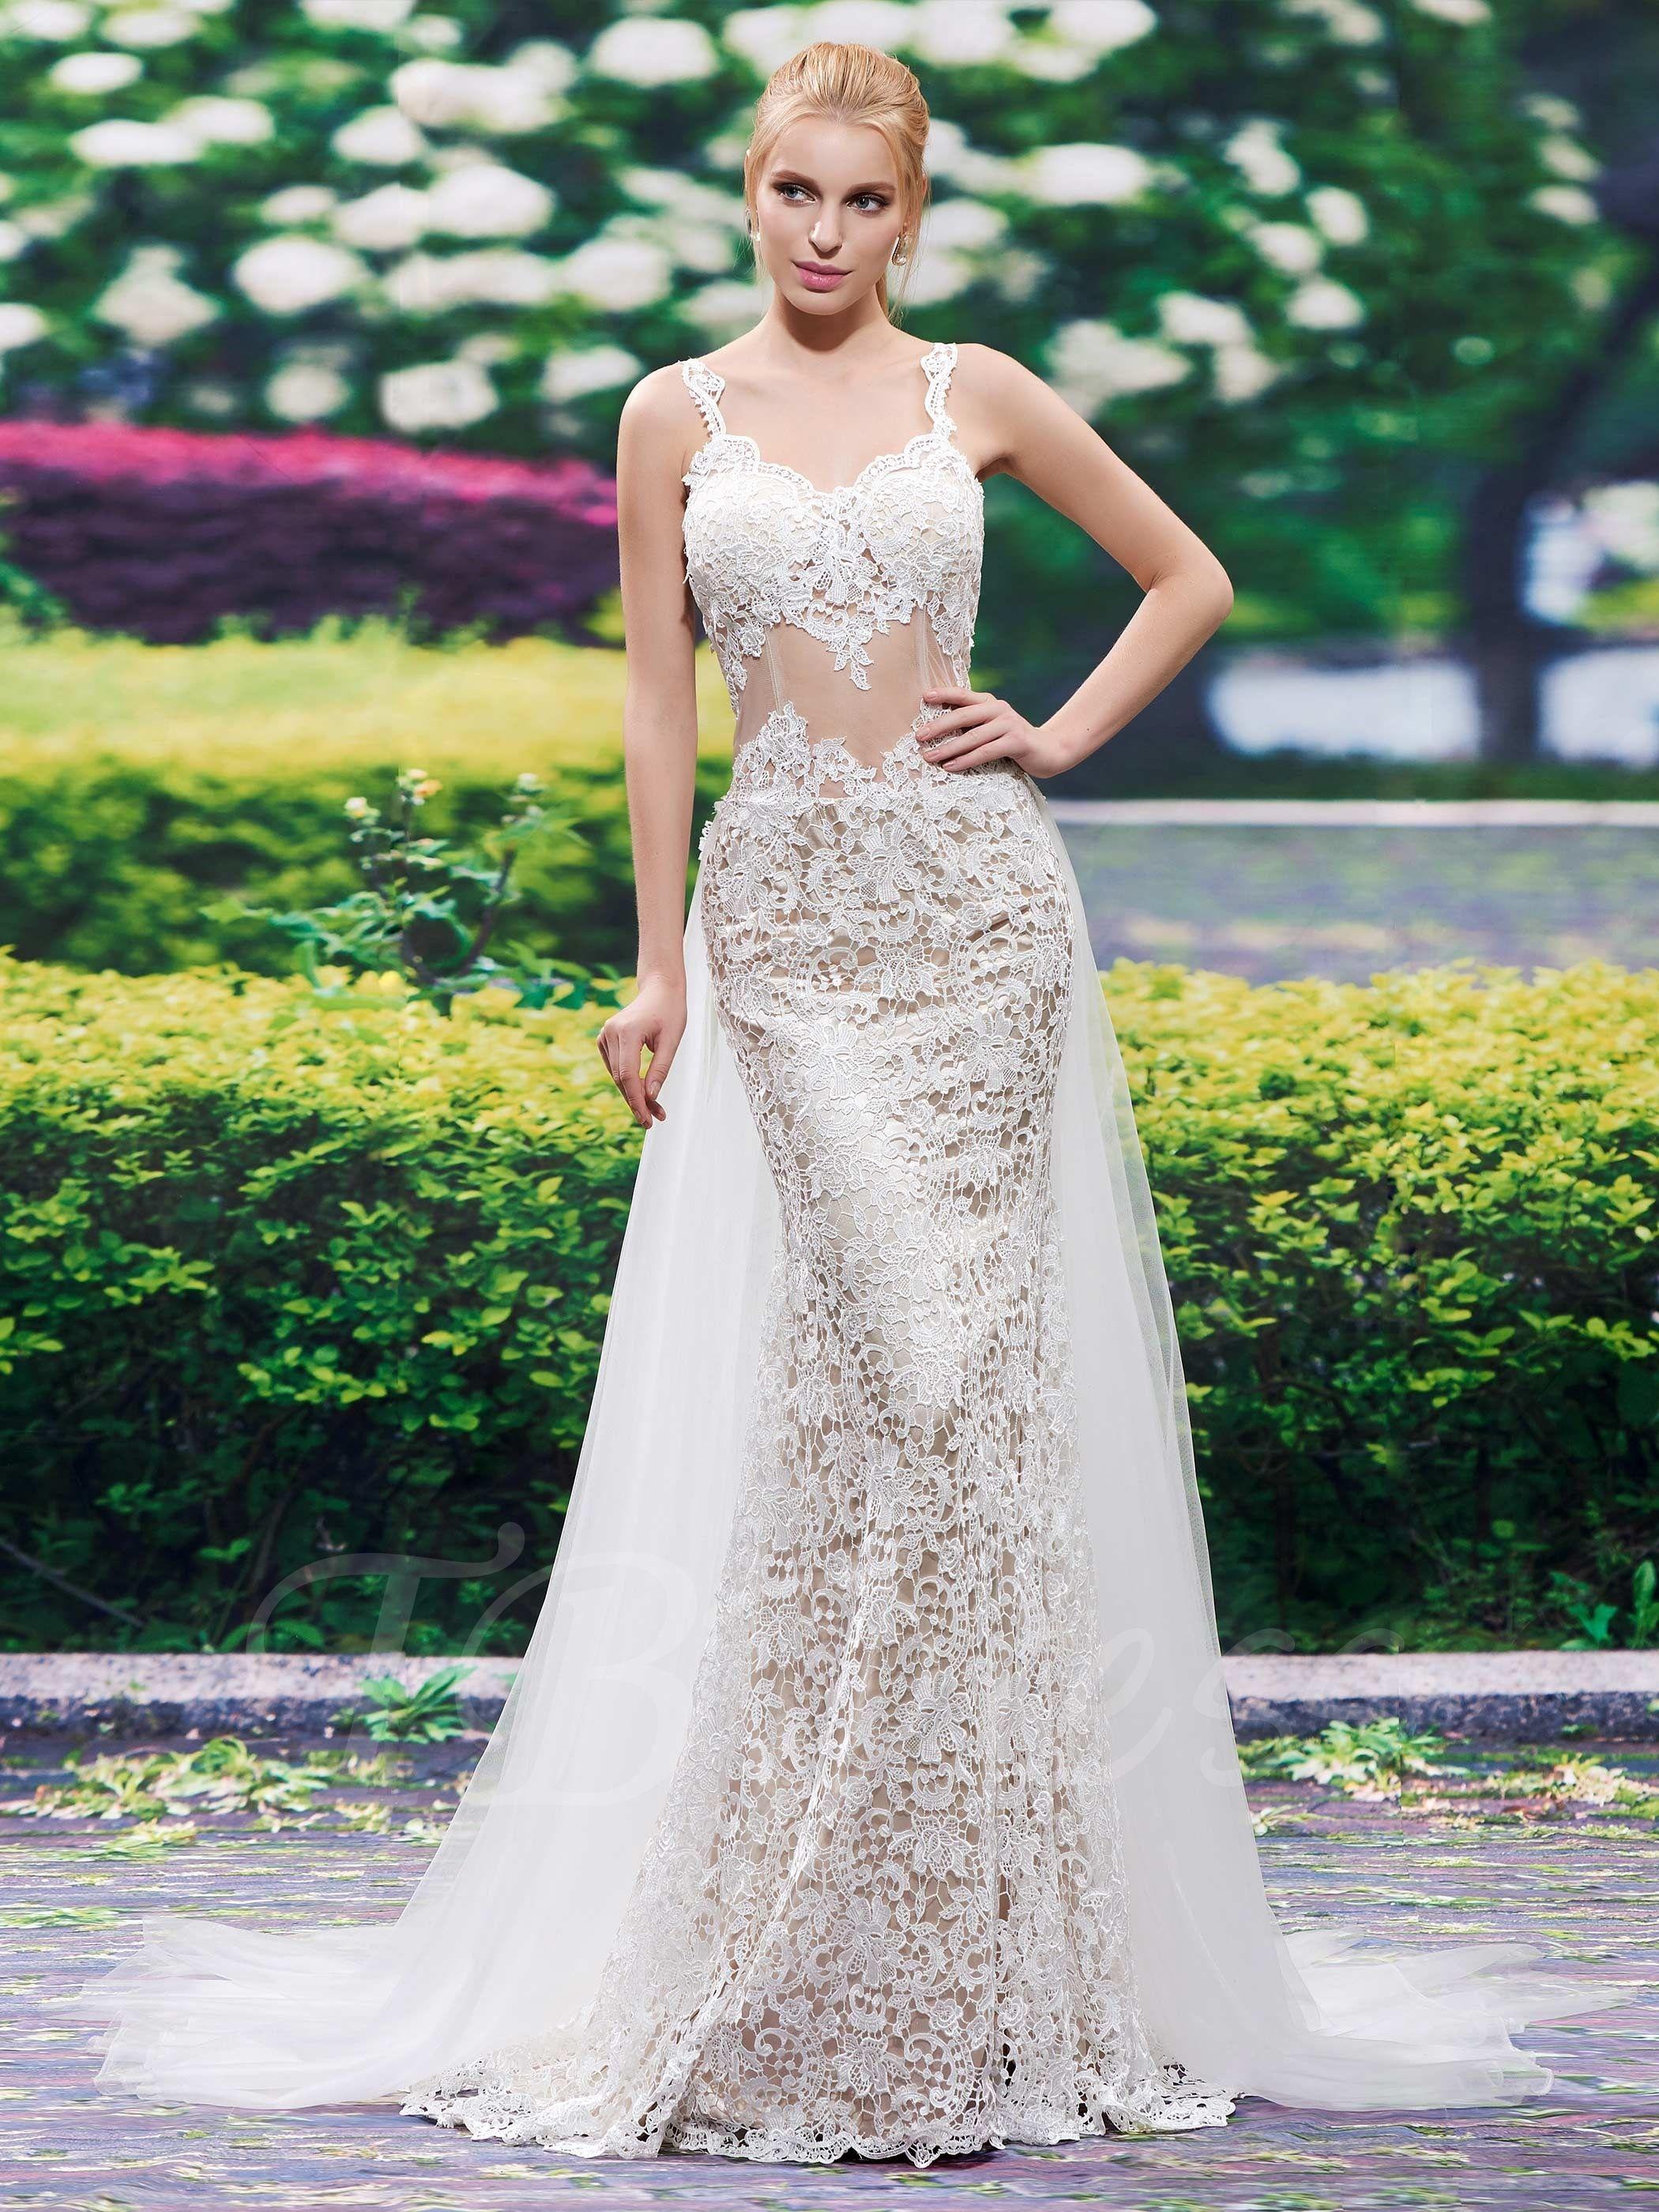 Spaghetti Straps Lace Backless Mermaid Wedding Dress ...